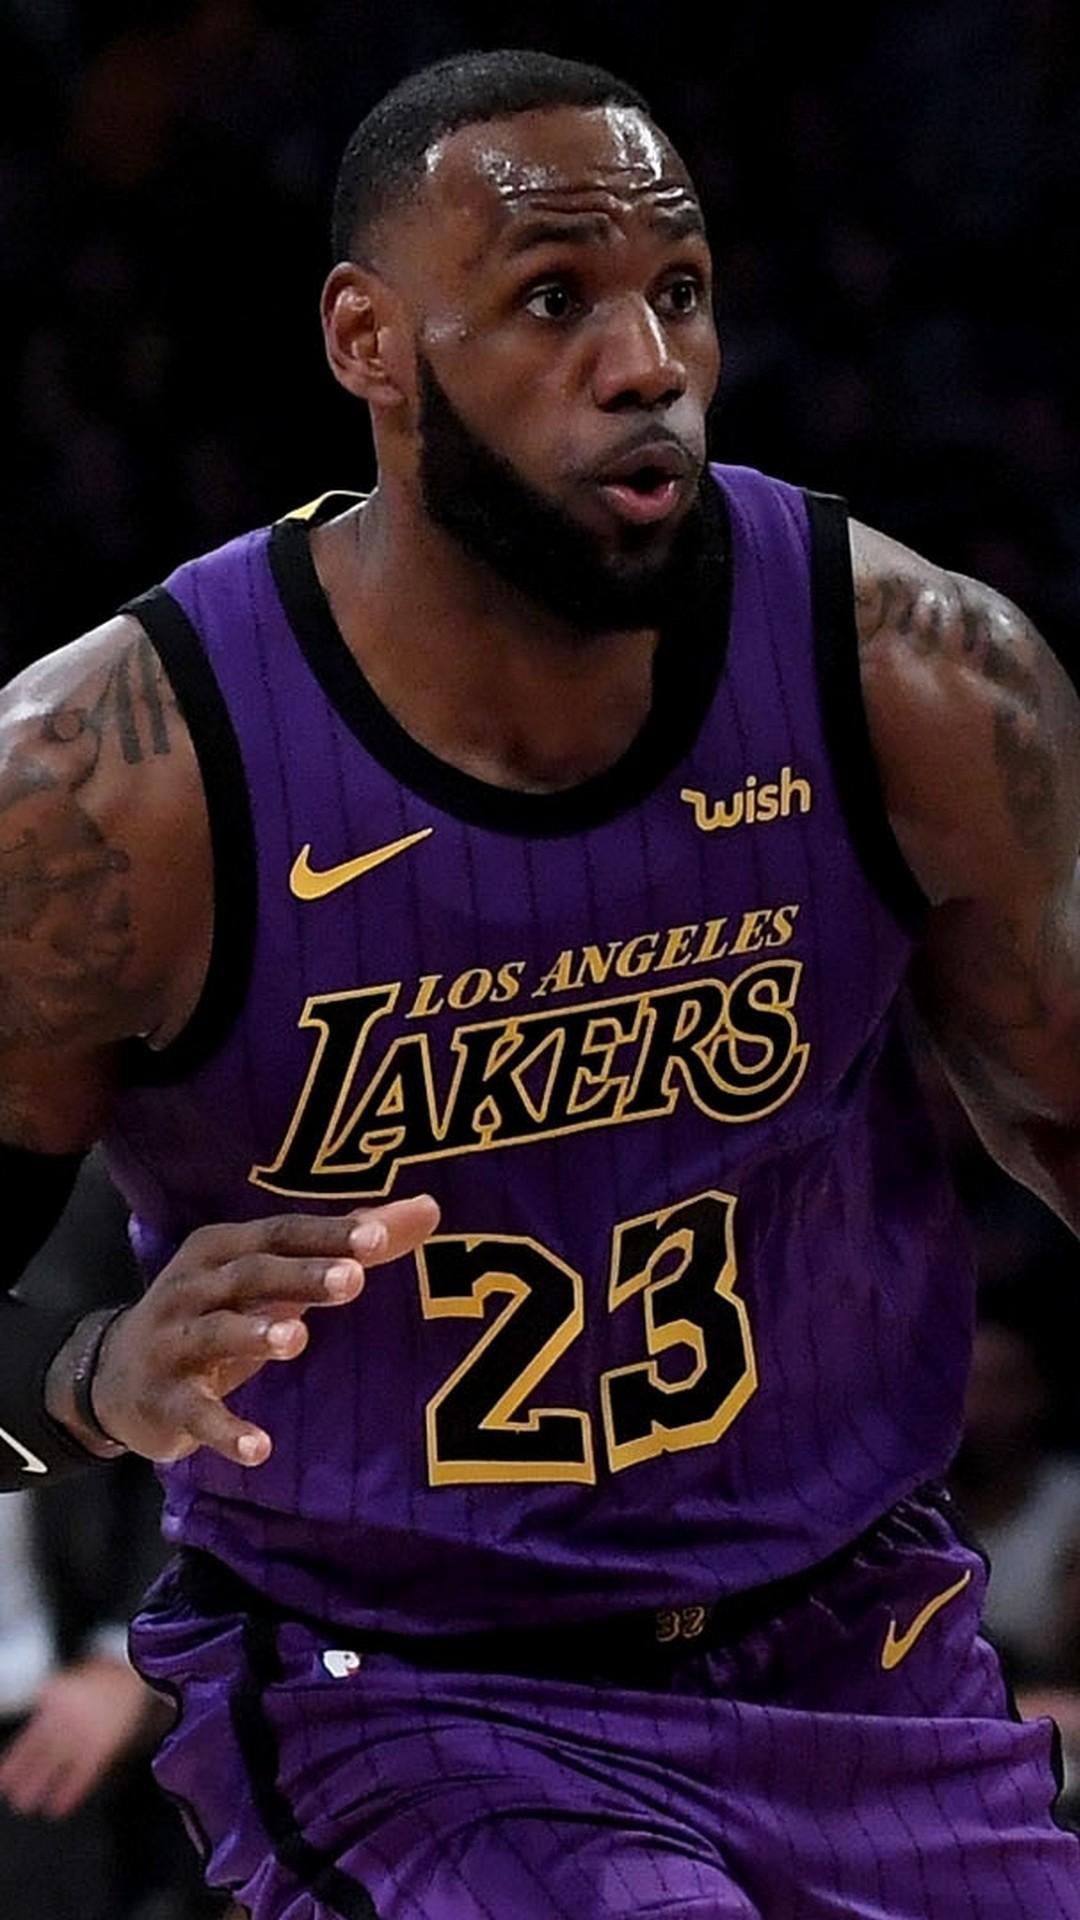 LeBron James LA Lakers Wallpaper iPhone HD 2020 Basketball Wallpaper 1080x1920